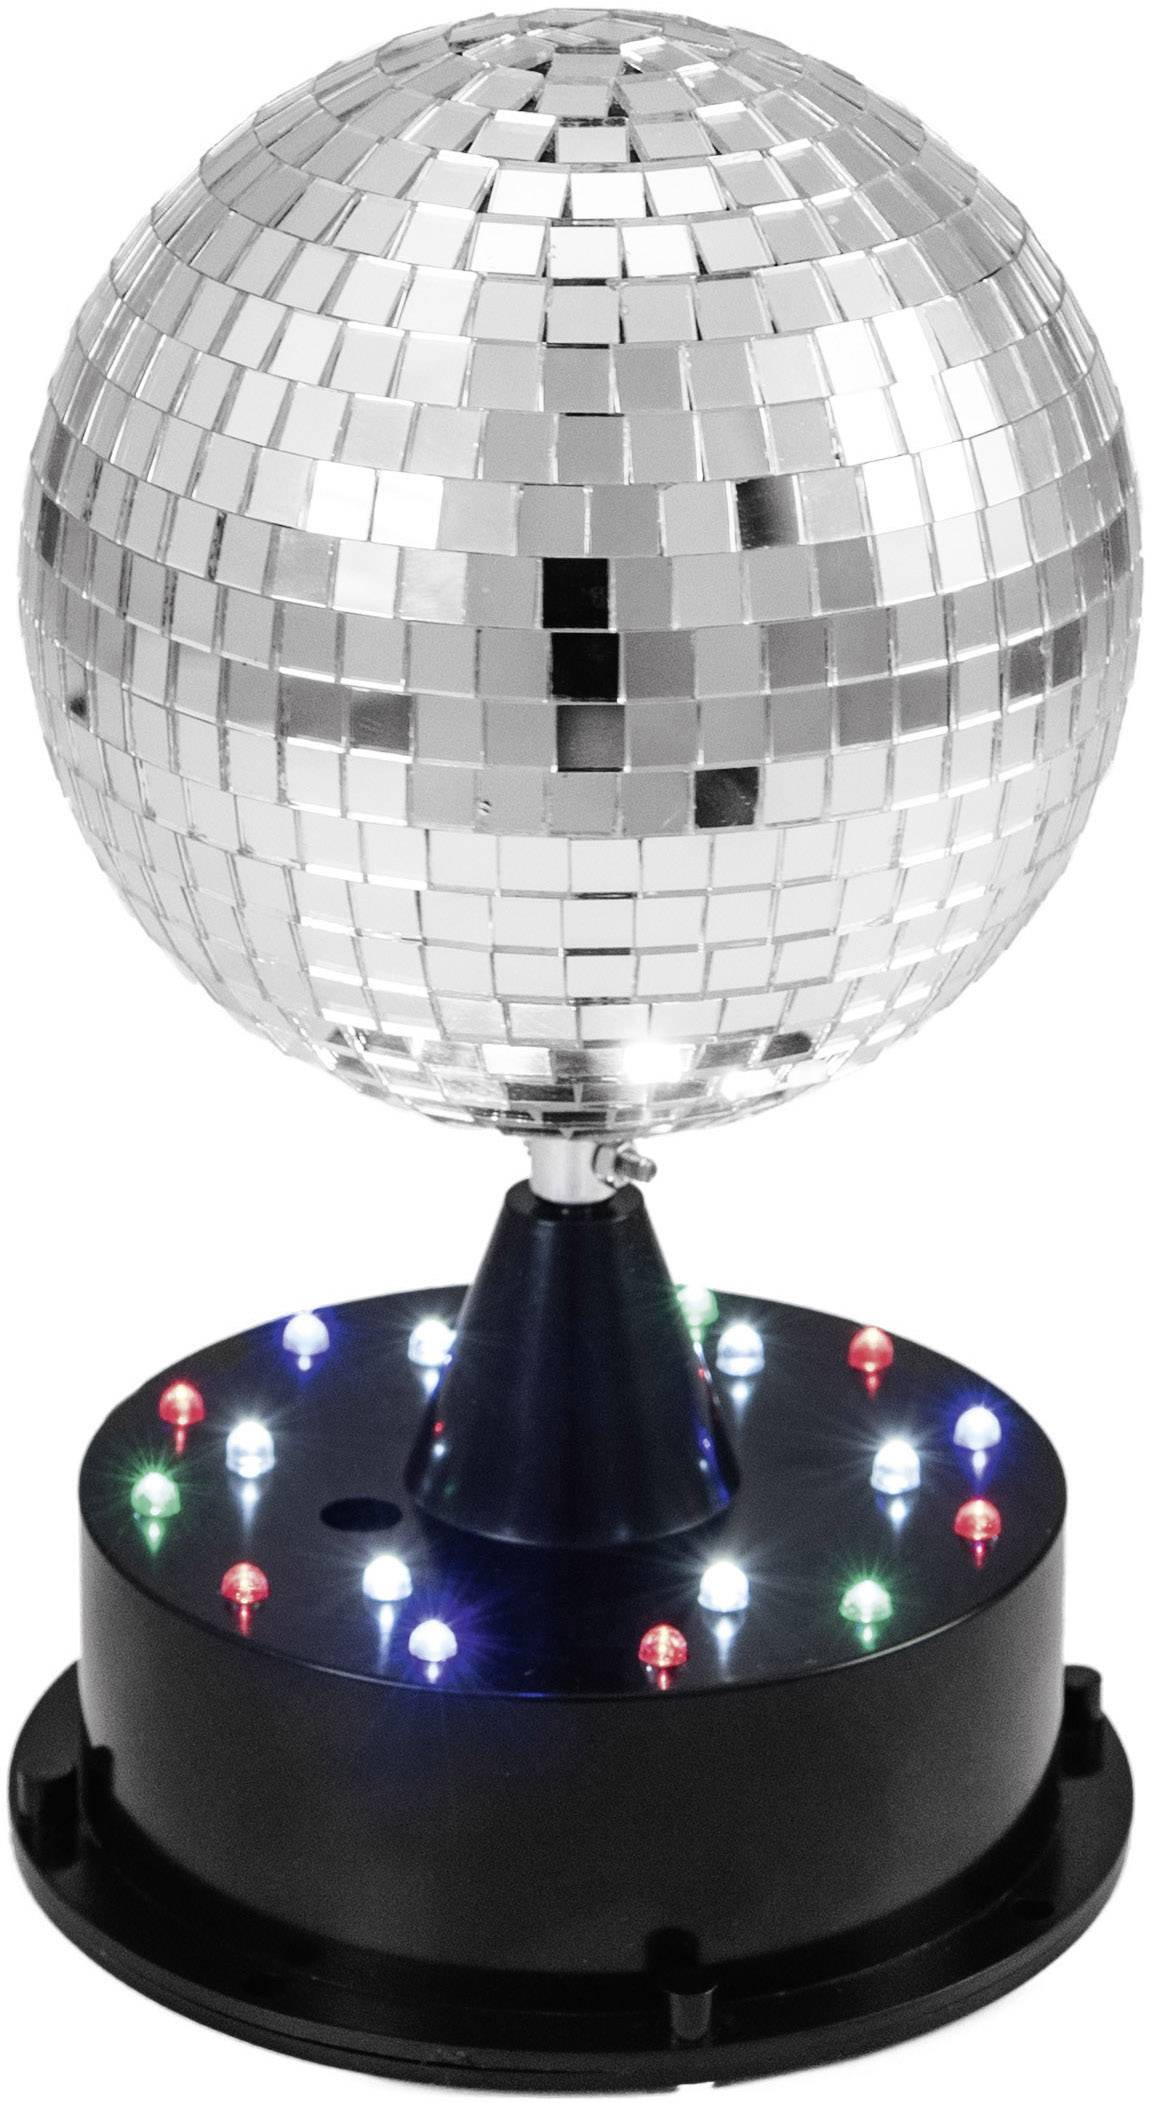 Eurolite 42109267 Led Discokugel Set Mit Standfuss Mit Led Beleuchtung 13 Cm